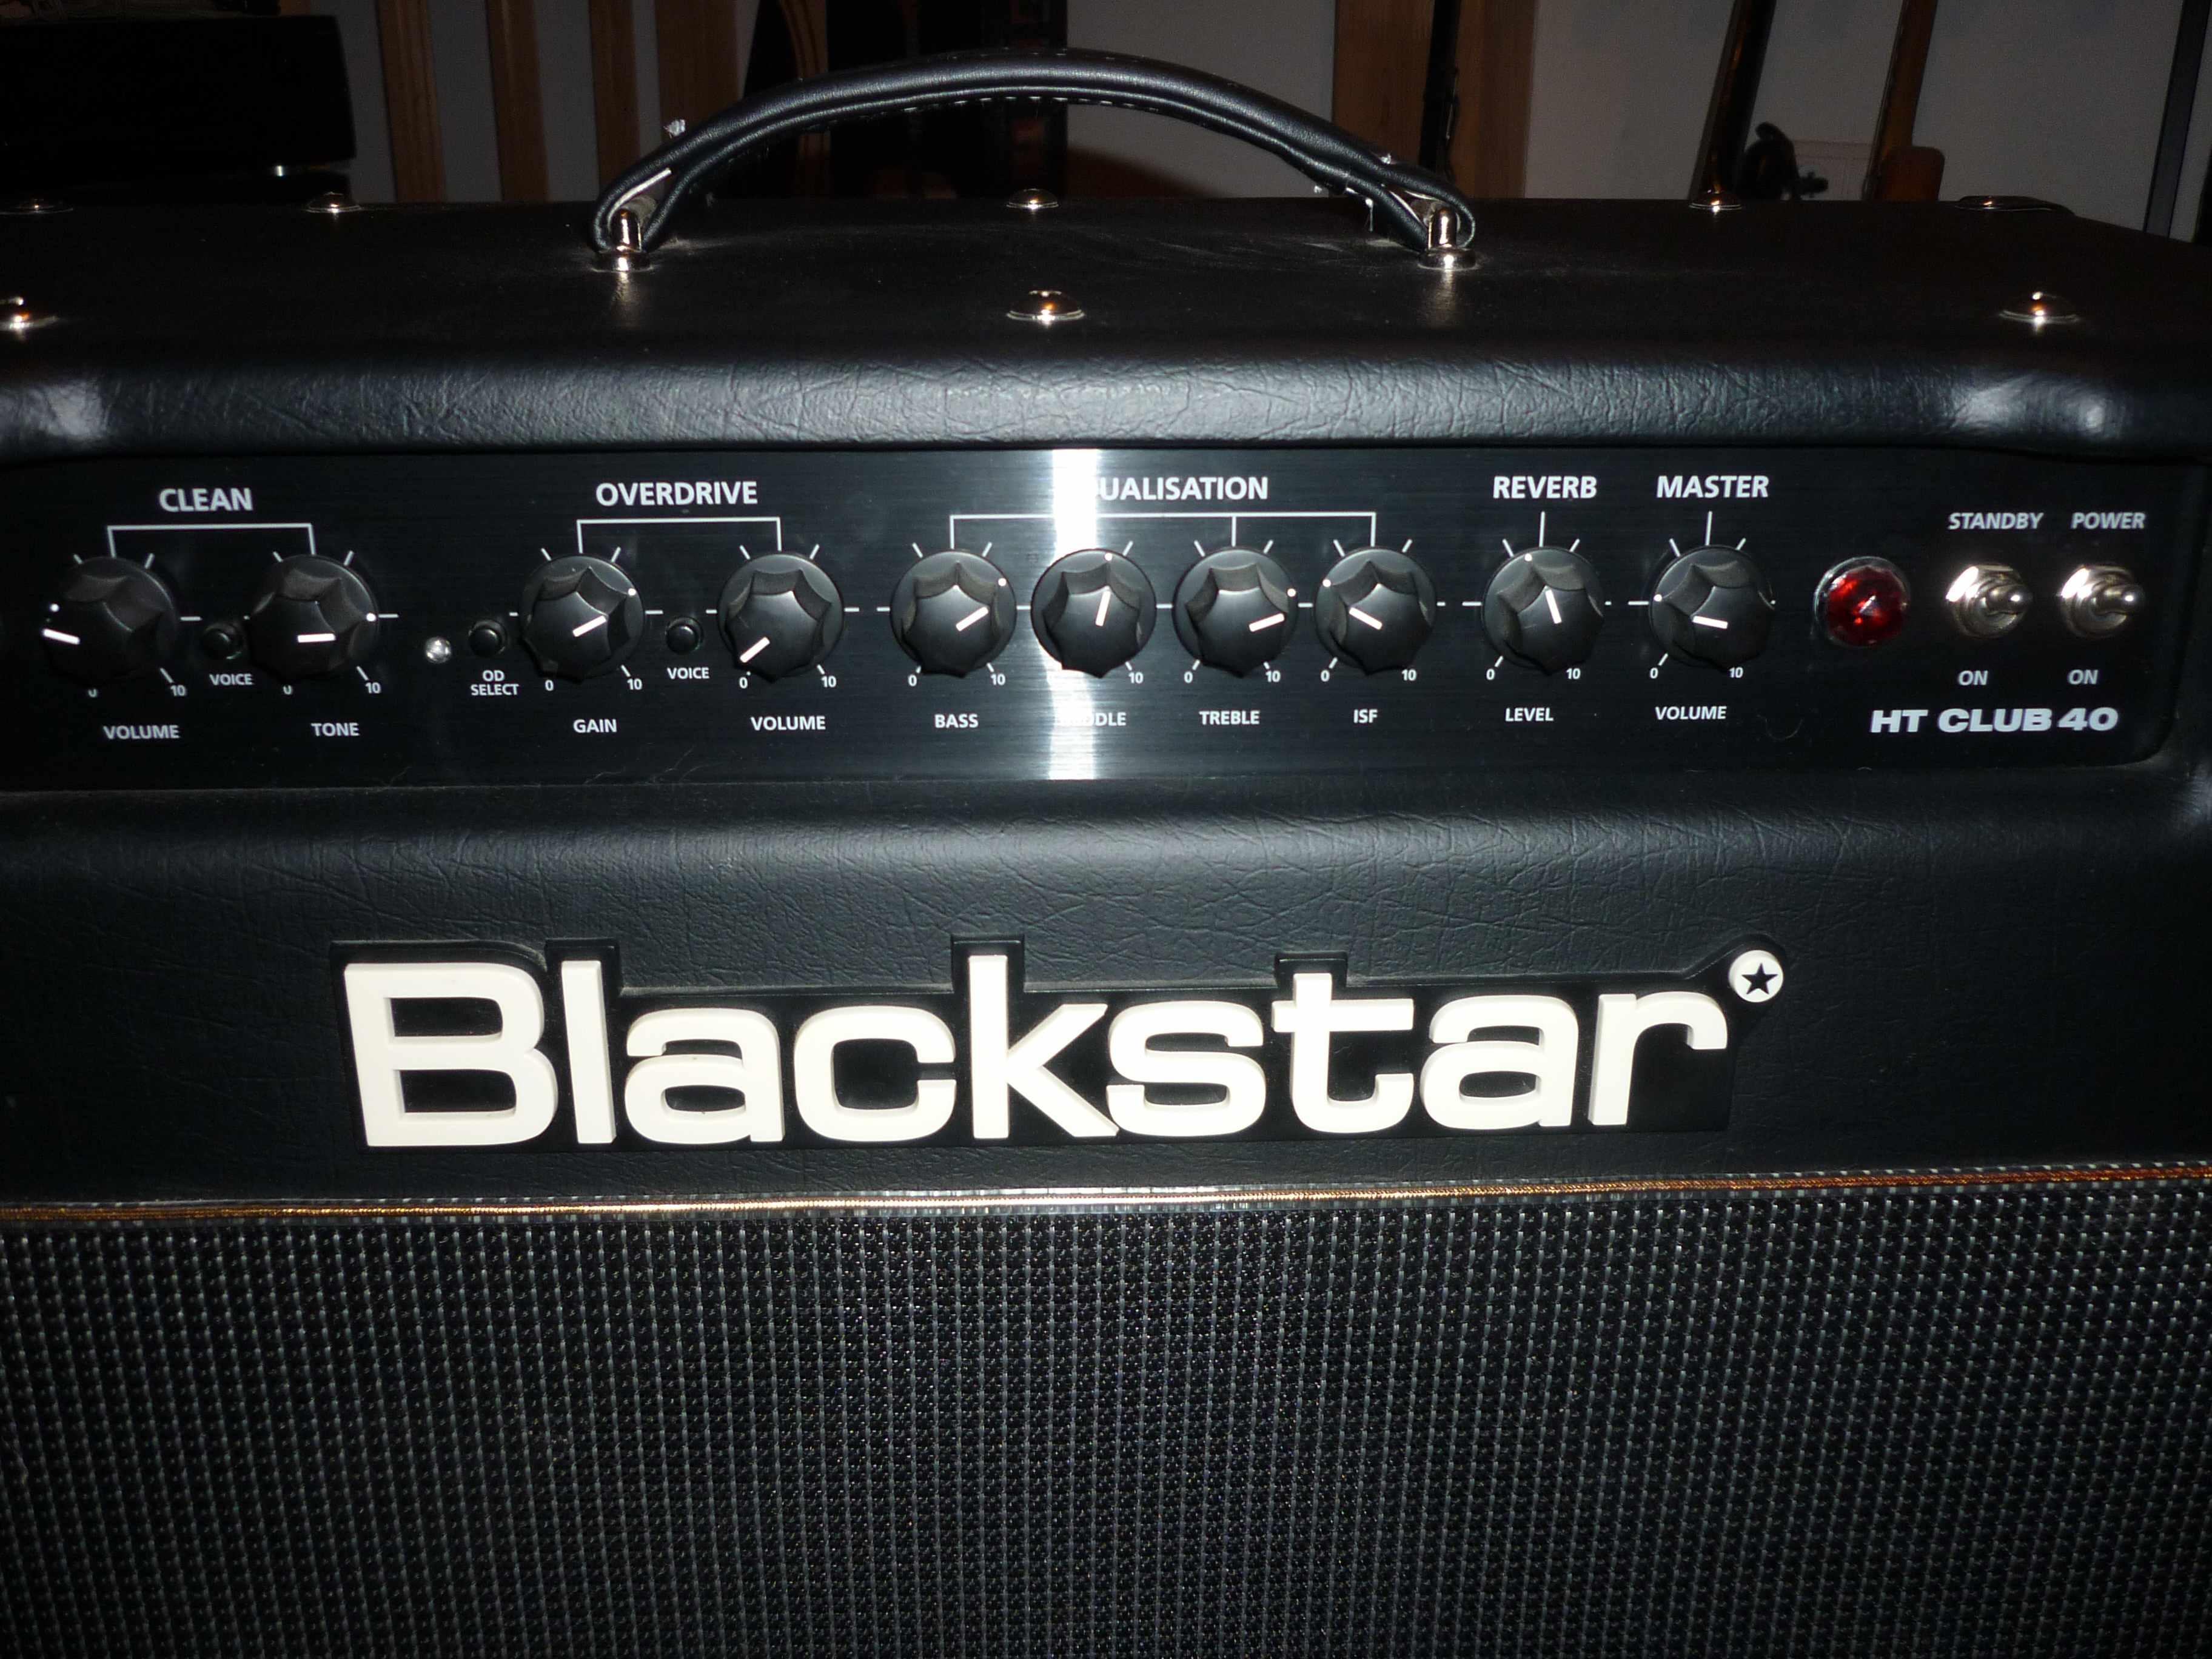 blackstar amplification ht club 40 image 755661 audiofanzine. Black Bedroom Furniture Sets. Home Design Ideas